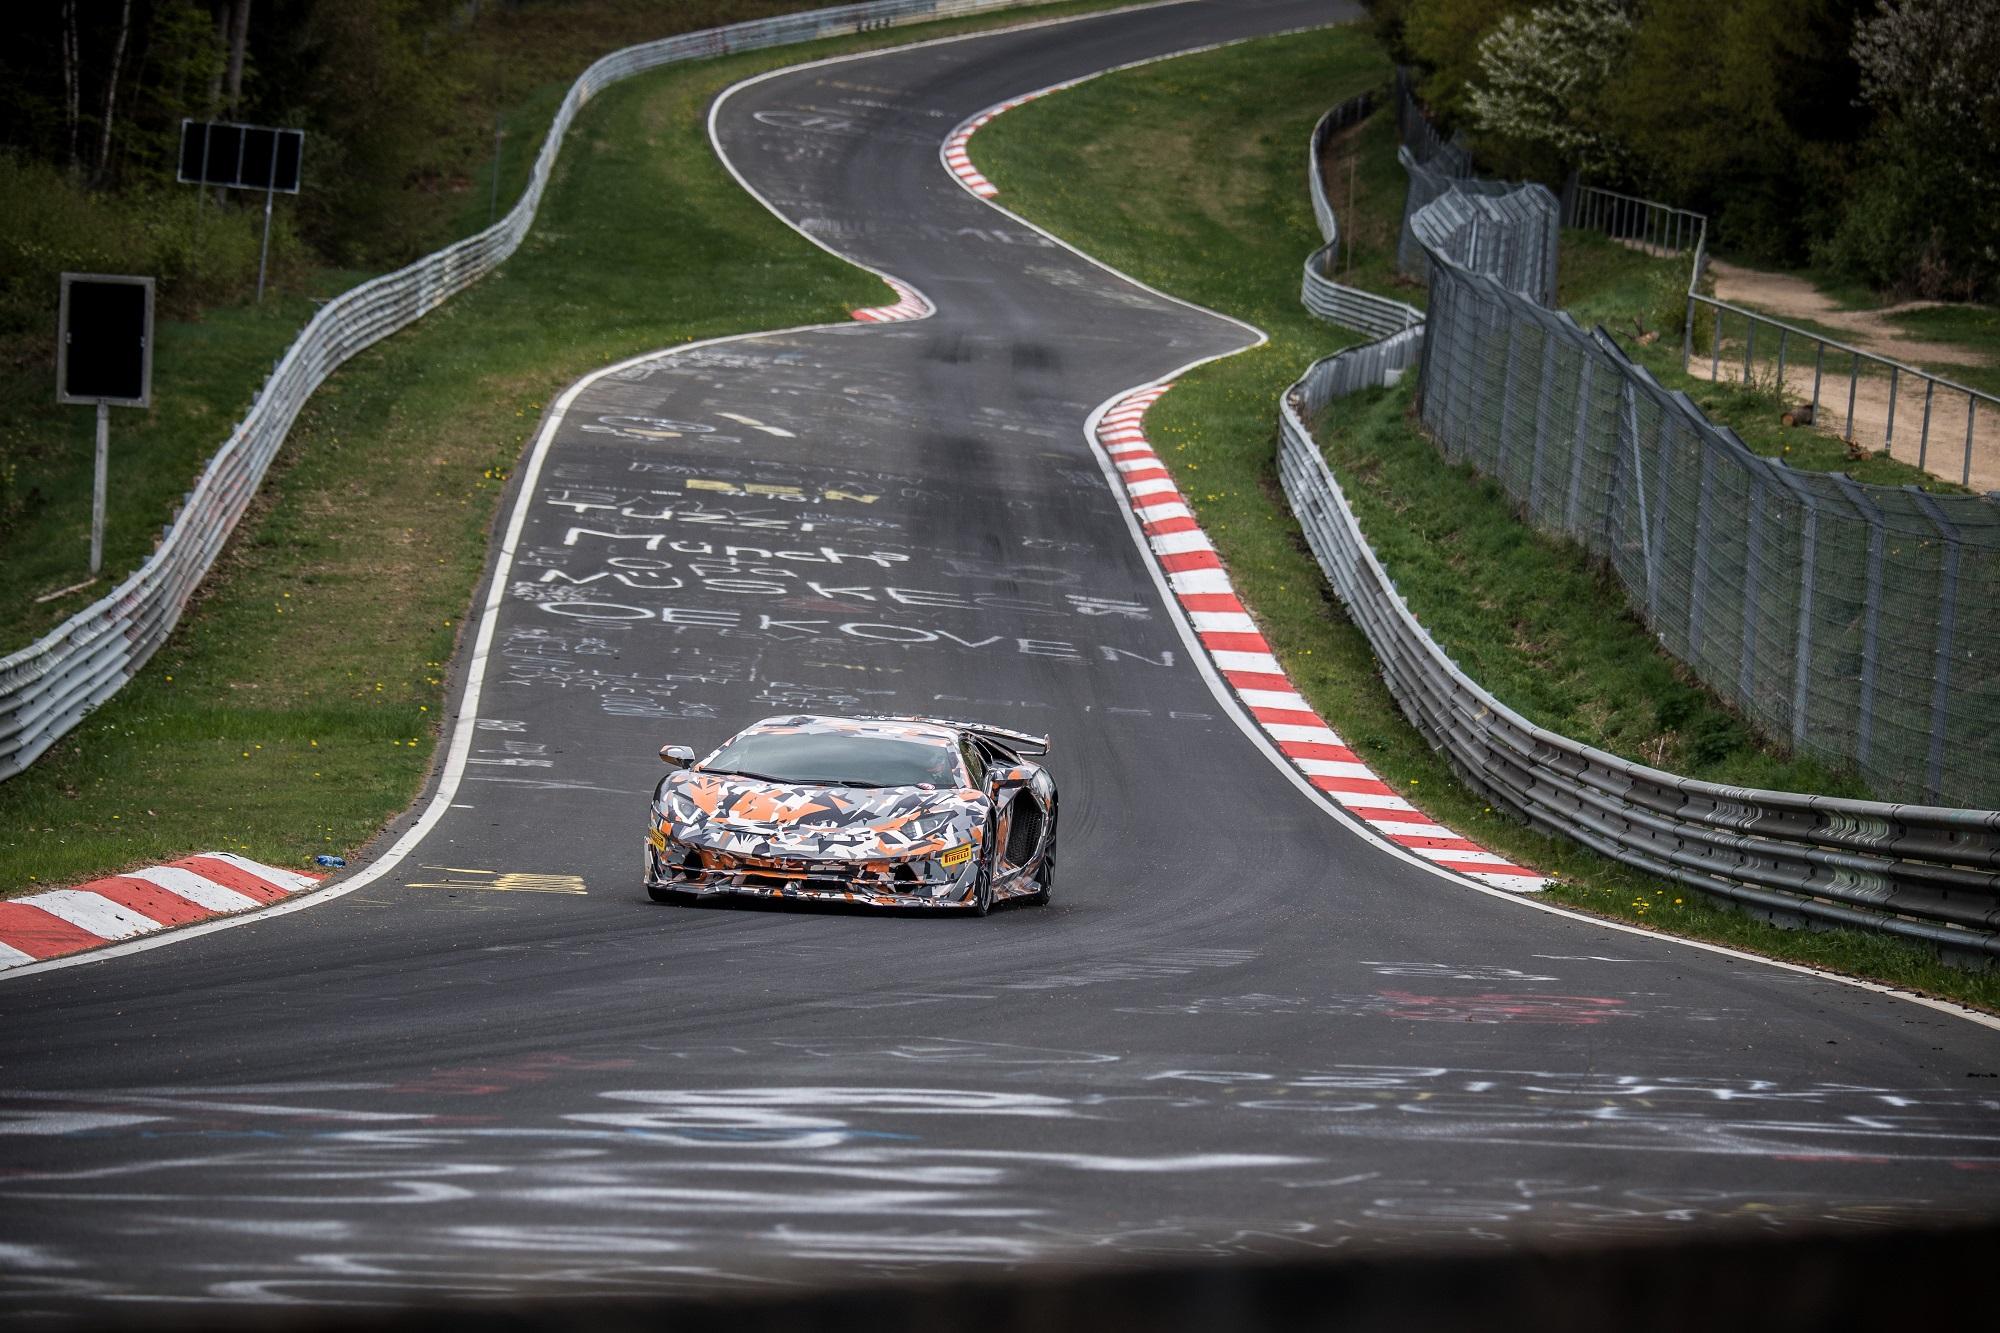 Lamborghini Aventador SVJ Jota Nurburgring 6SpeedOnline.com